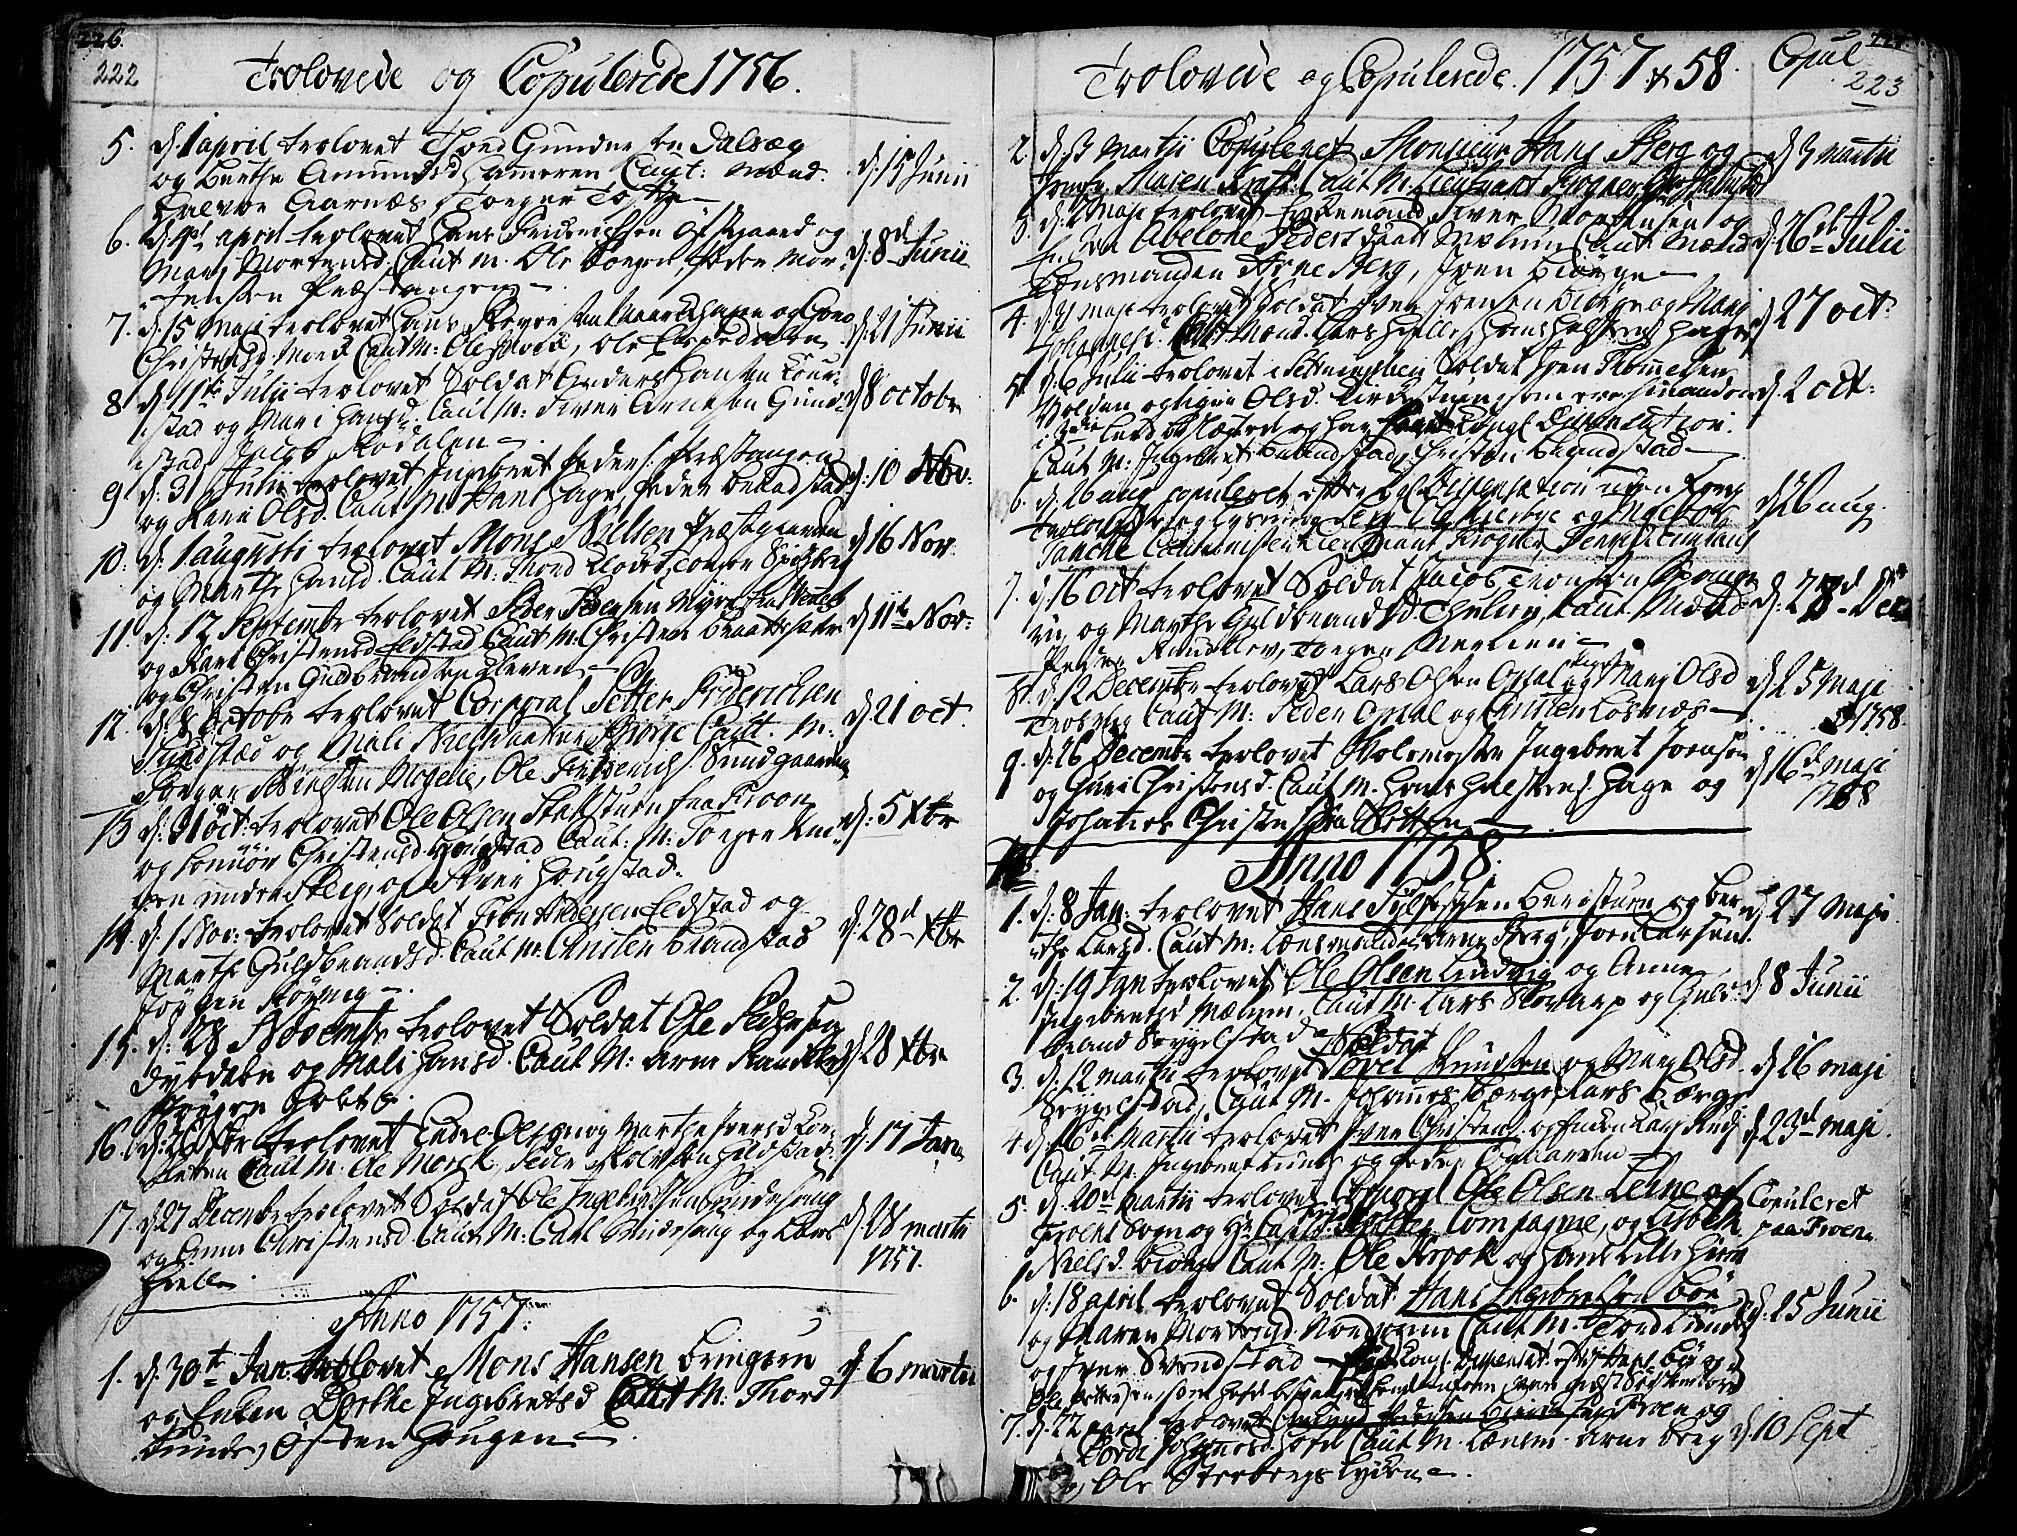 SAH, Ringebu prestekontor, Ministerialbok nr. 2, 1734-1780, s. 222-223